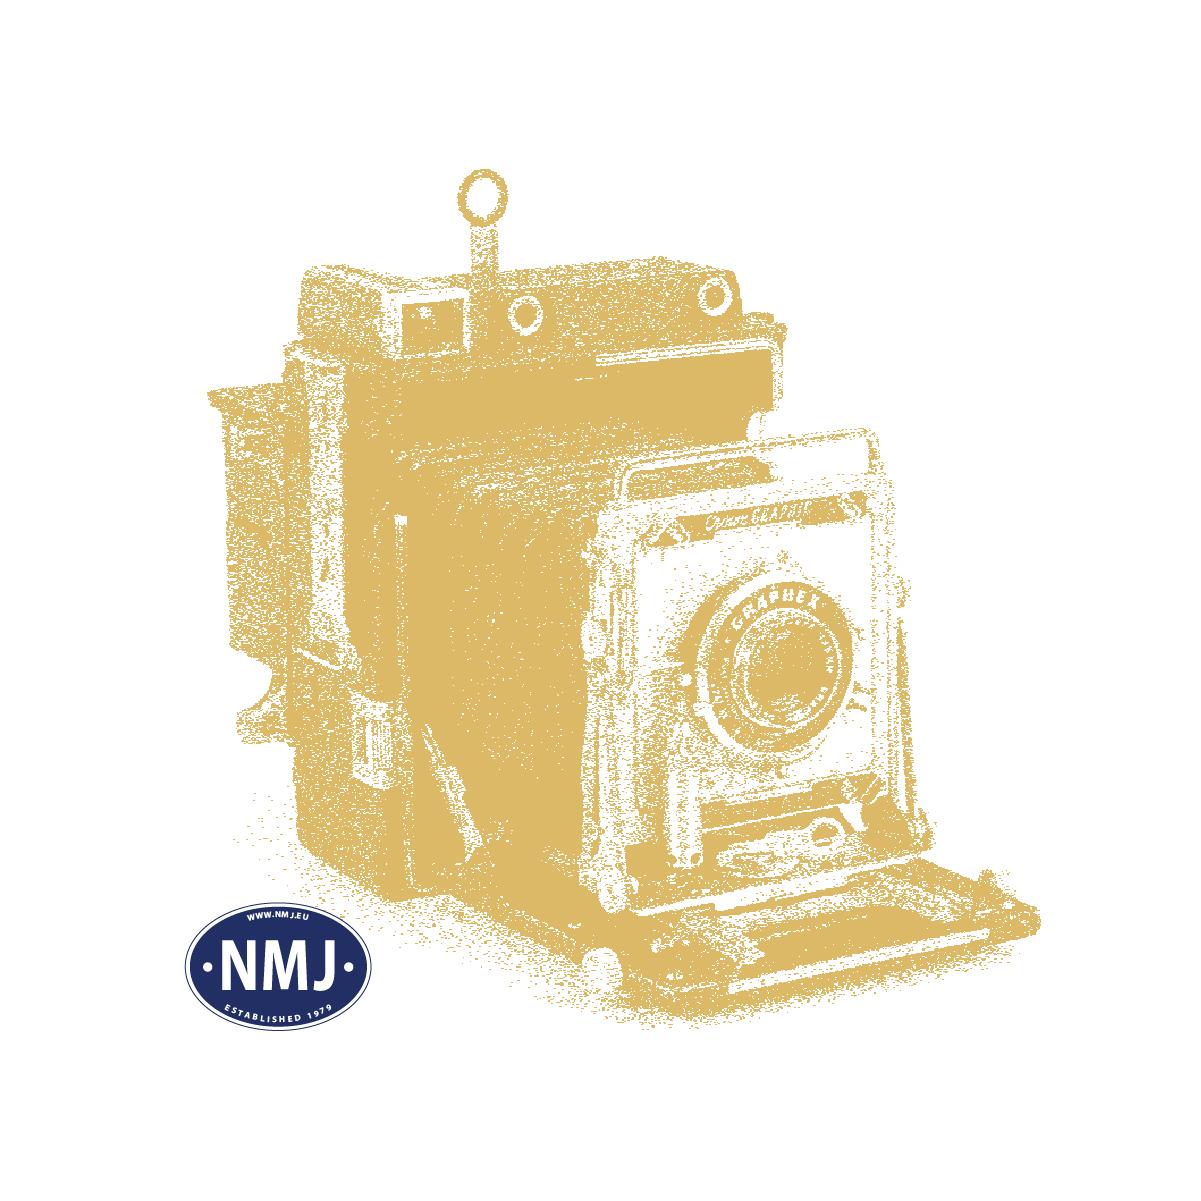 NMJT84.990 - NMJ Topline NSB BM 69-69c Beleuchtungsset 2 teilig